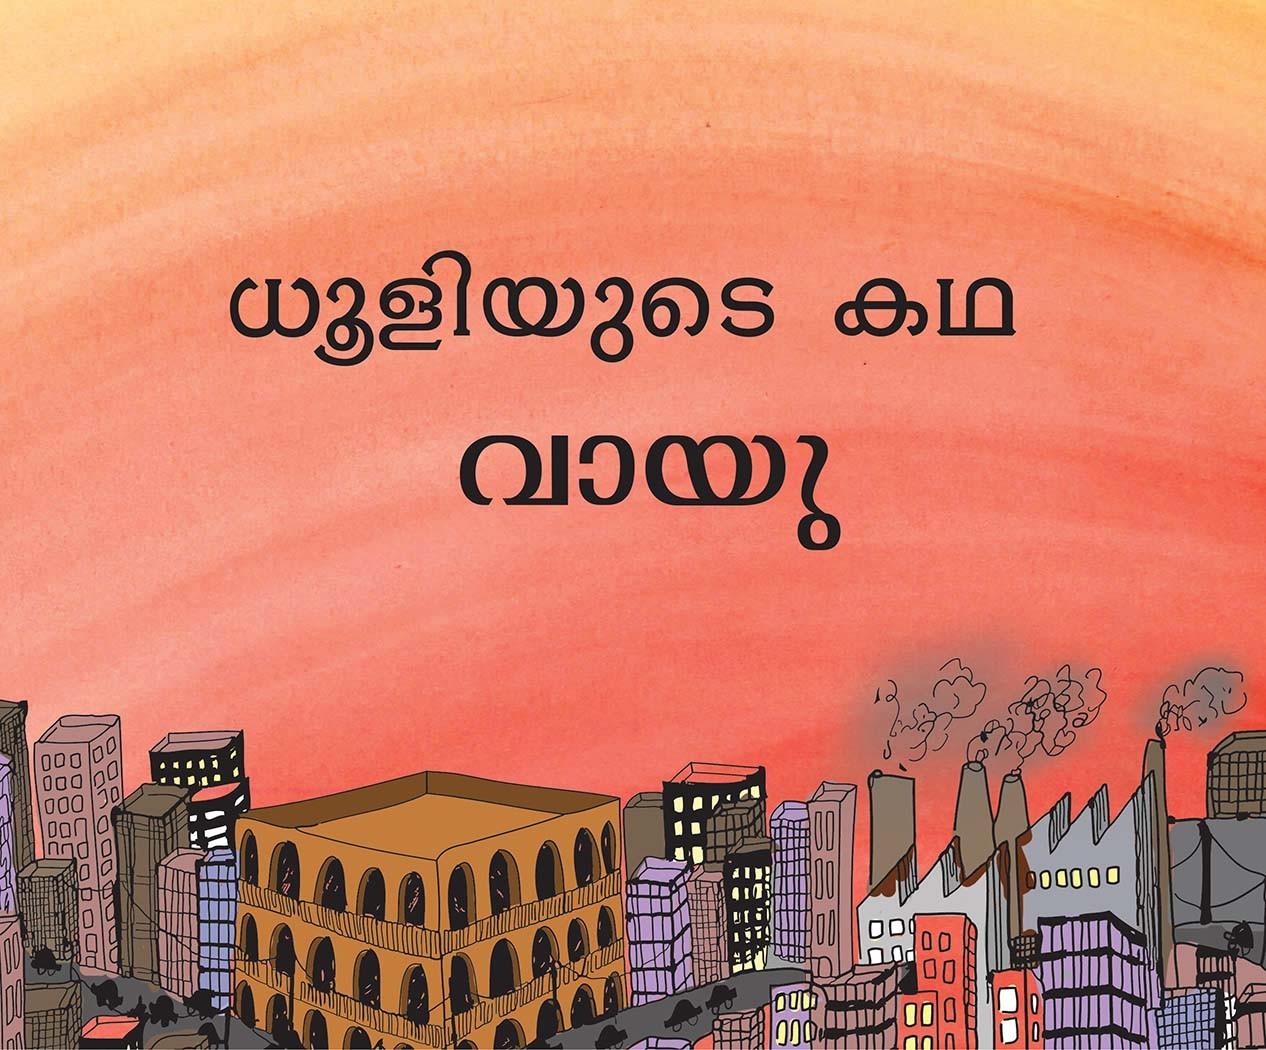 Dhooli's Story-Air/Dhooliyude Katha-Vayu (Malayalam)